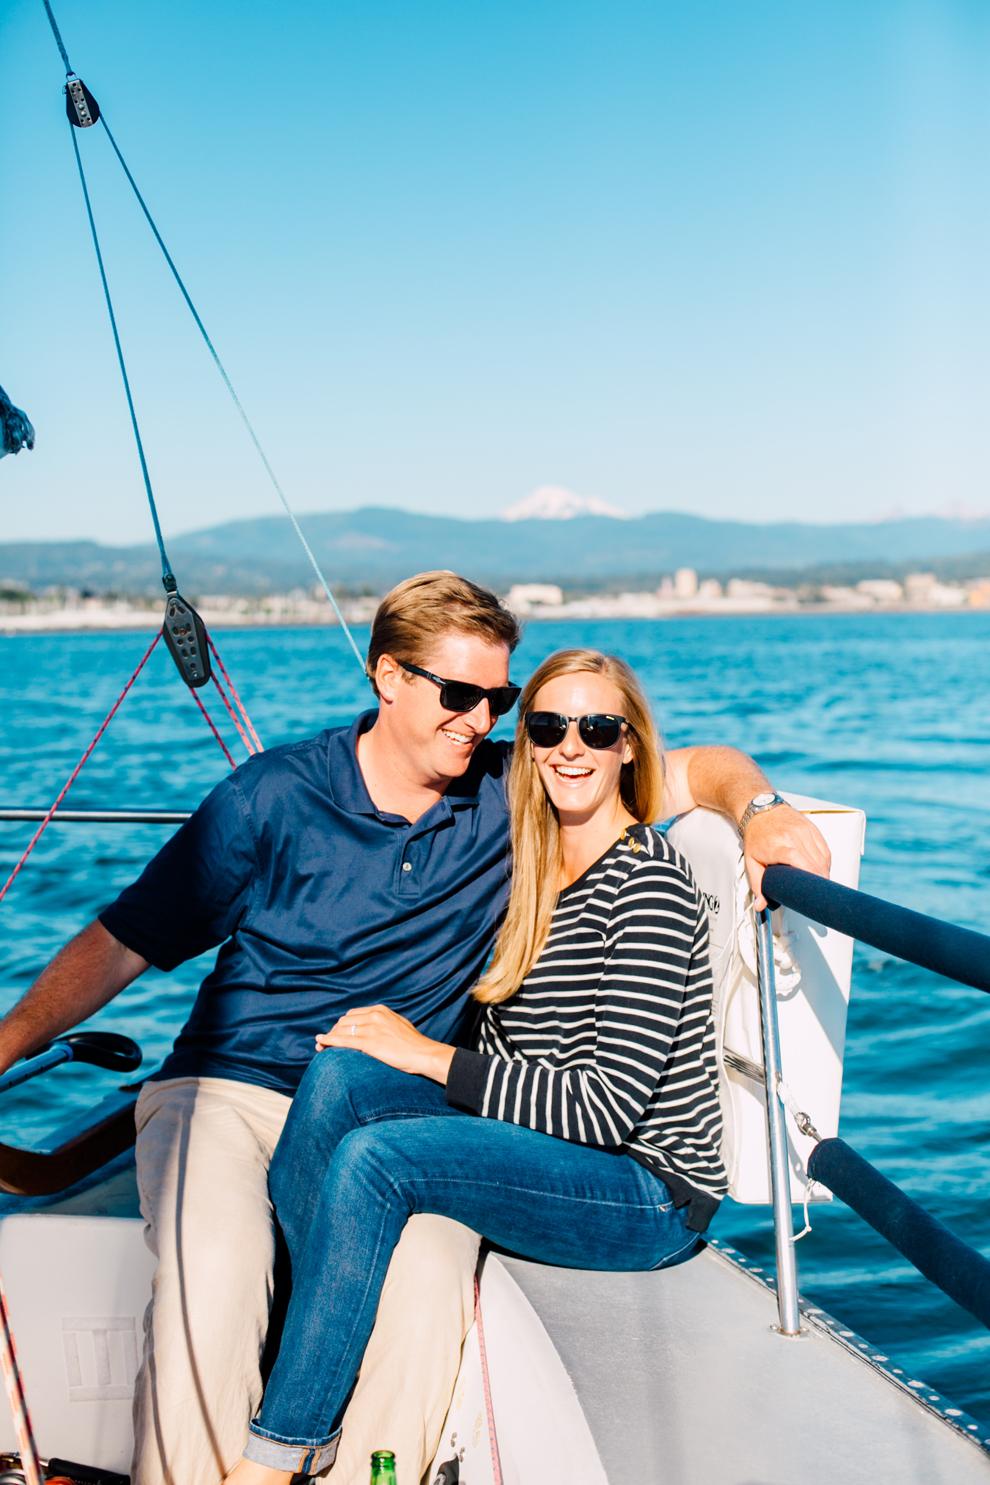 027-bellingham-bay-washington-sailboat-engagement-katheryn-moran-mickeykatie.jpg